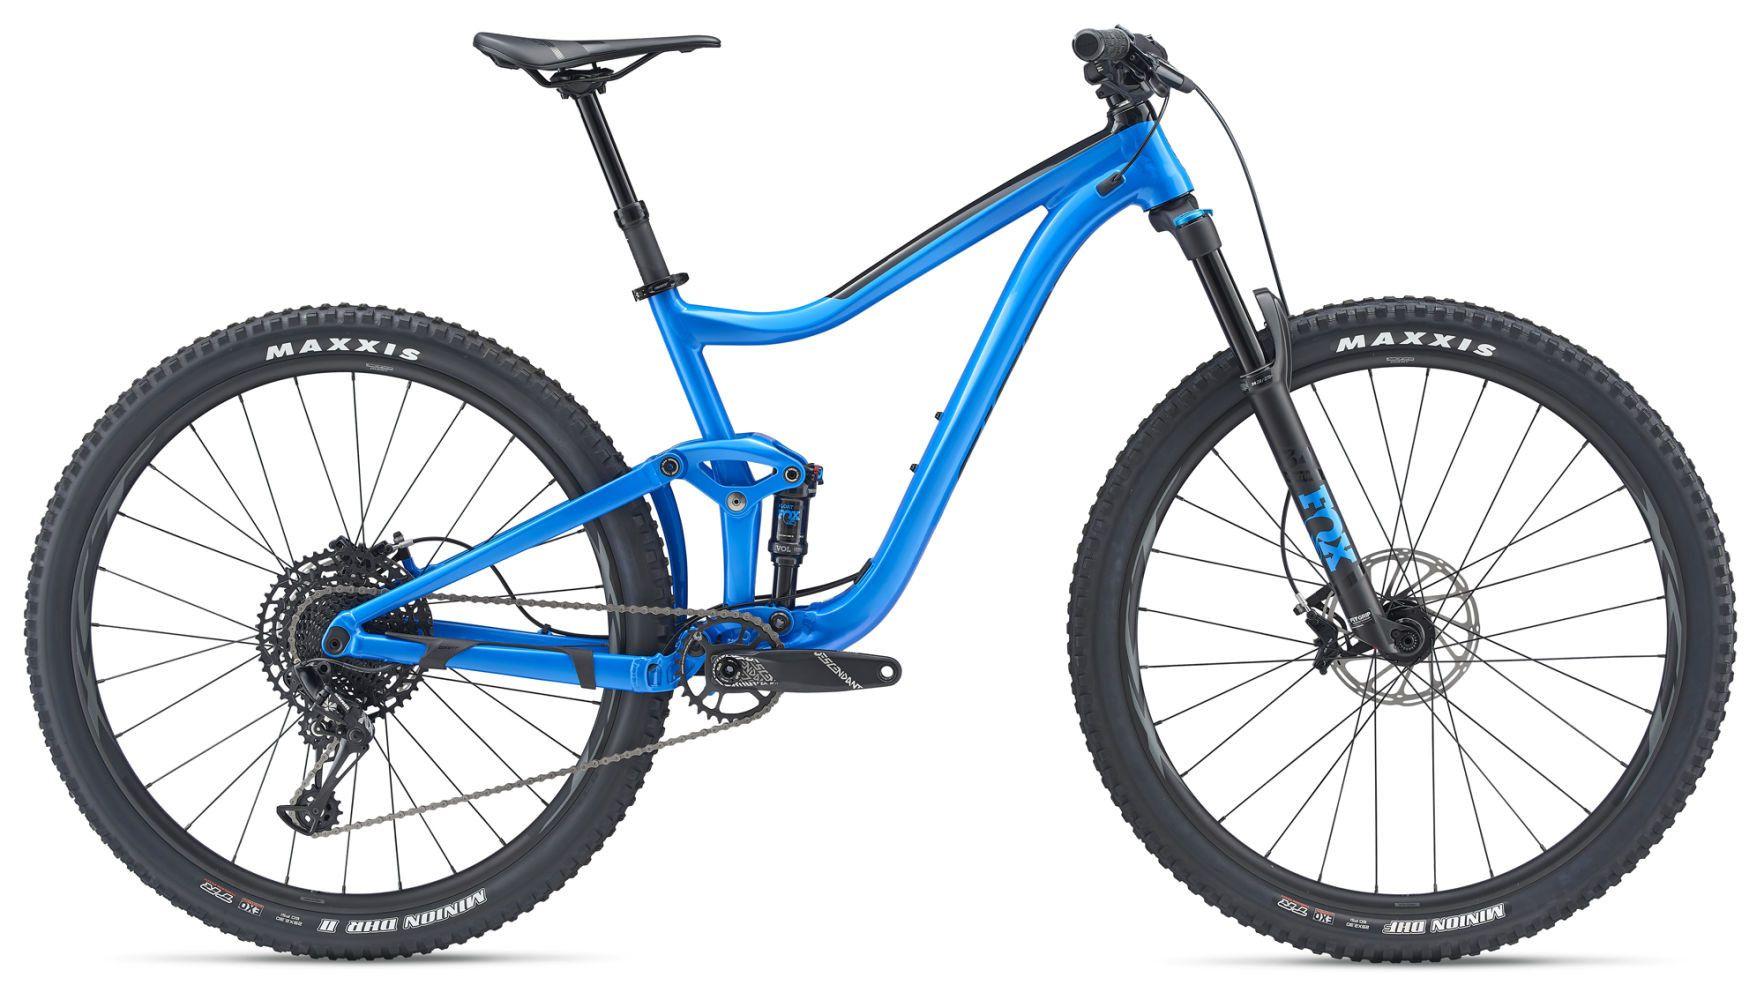 Bicicletta Giant Trance 29 2